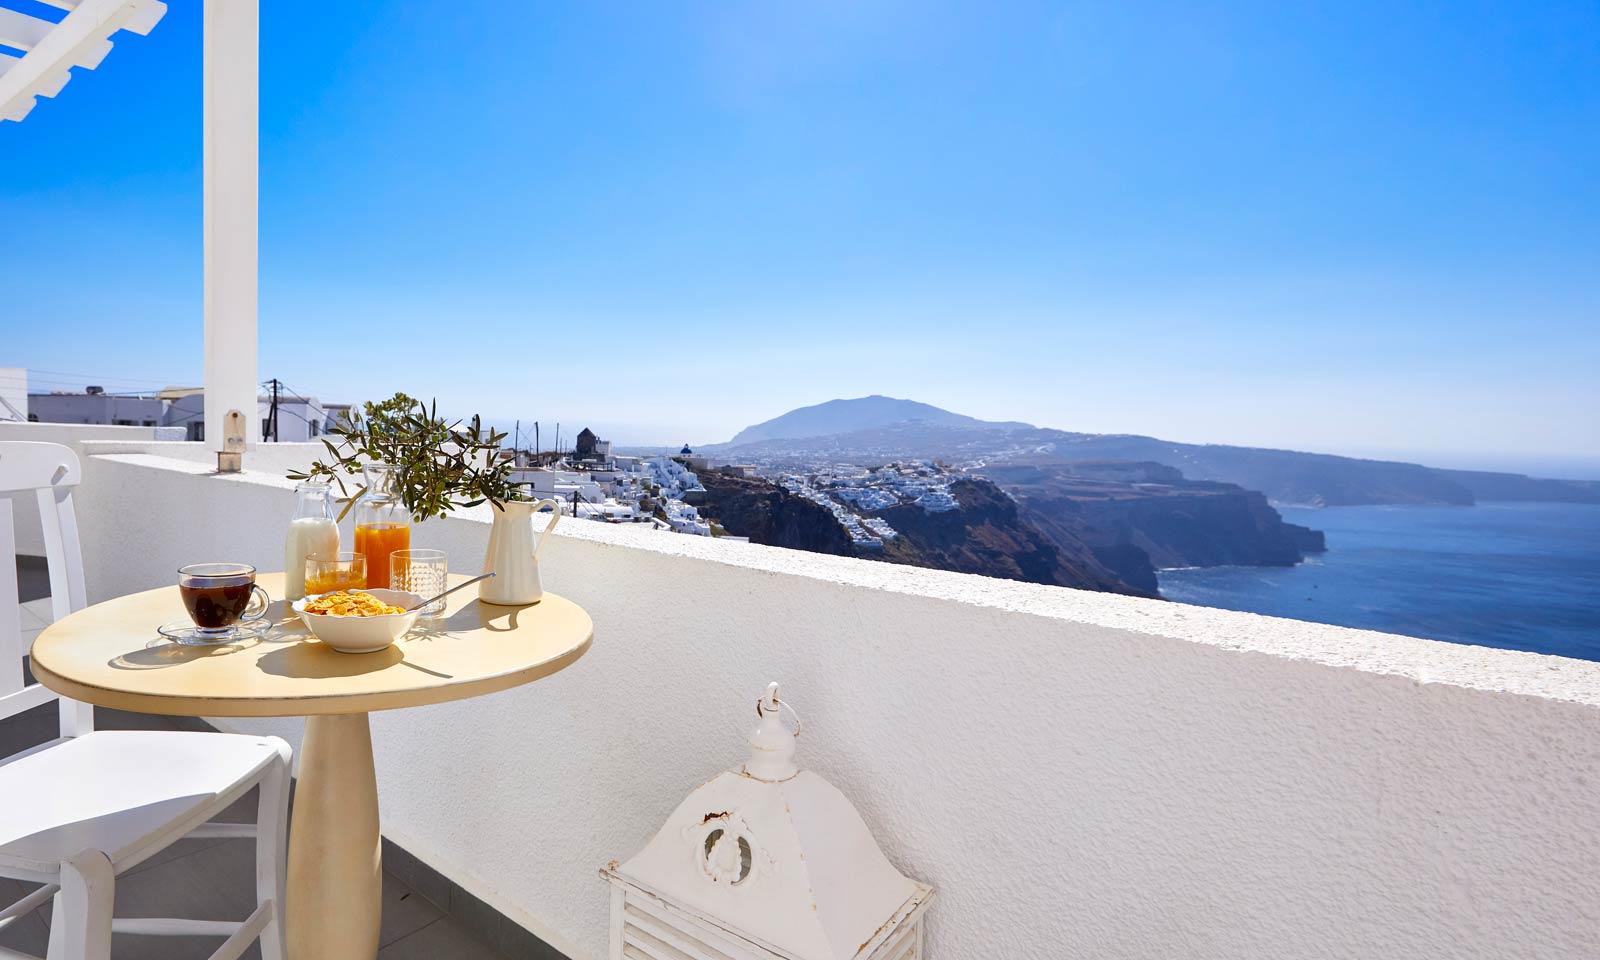 Elegant Balcony        With Cadera View